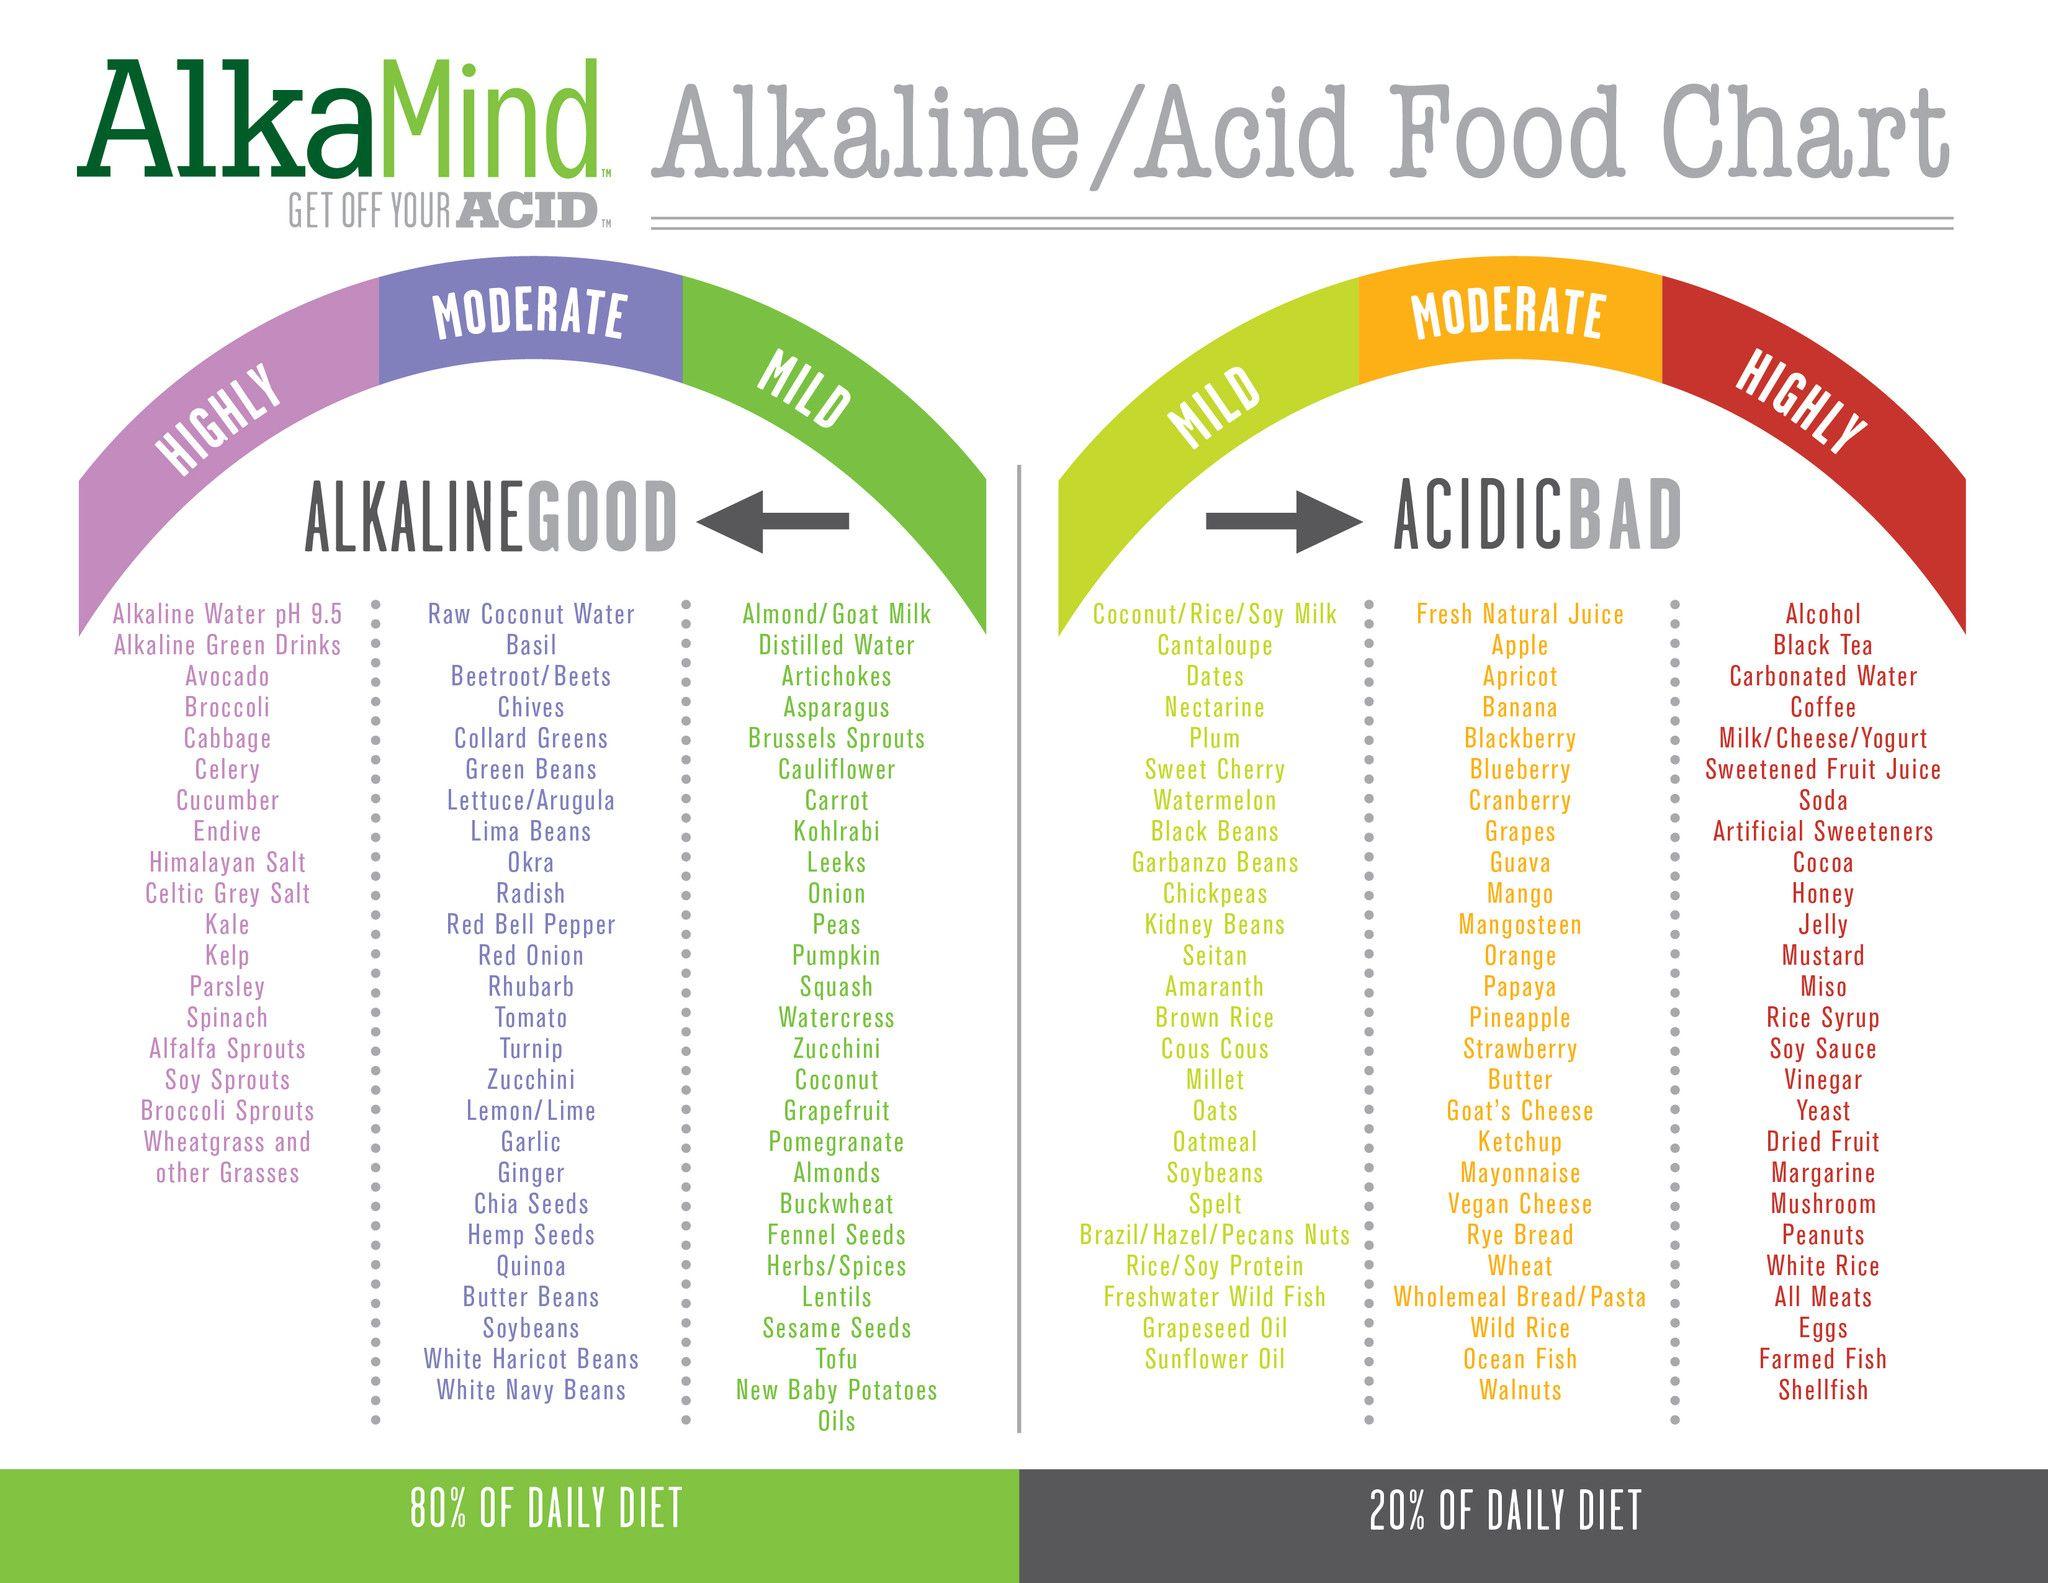 Alkaline acid food chart printable foodchart 11 13 02 02 2048x2048